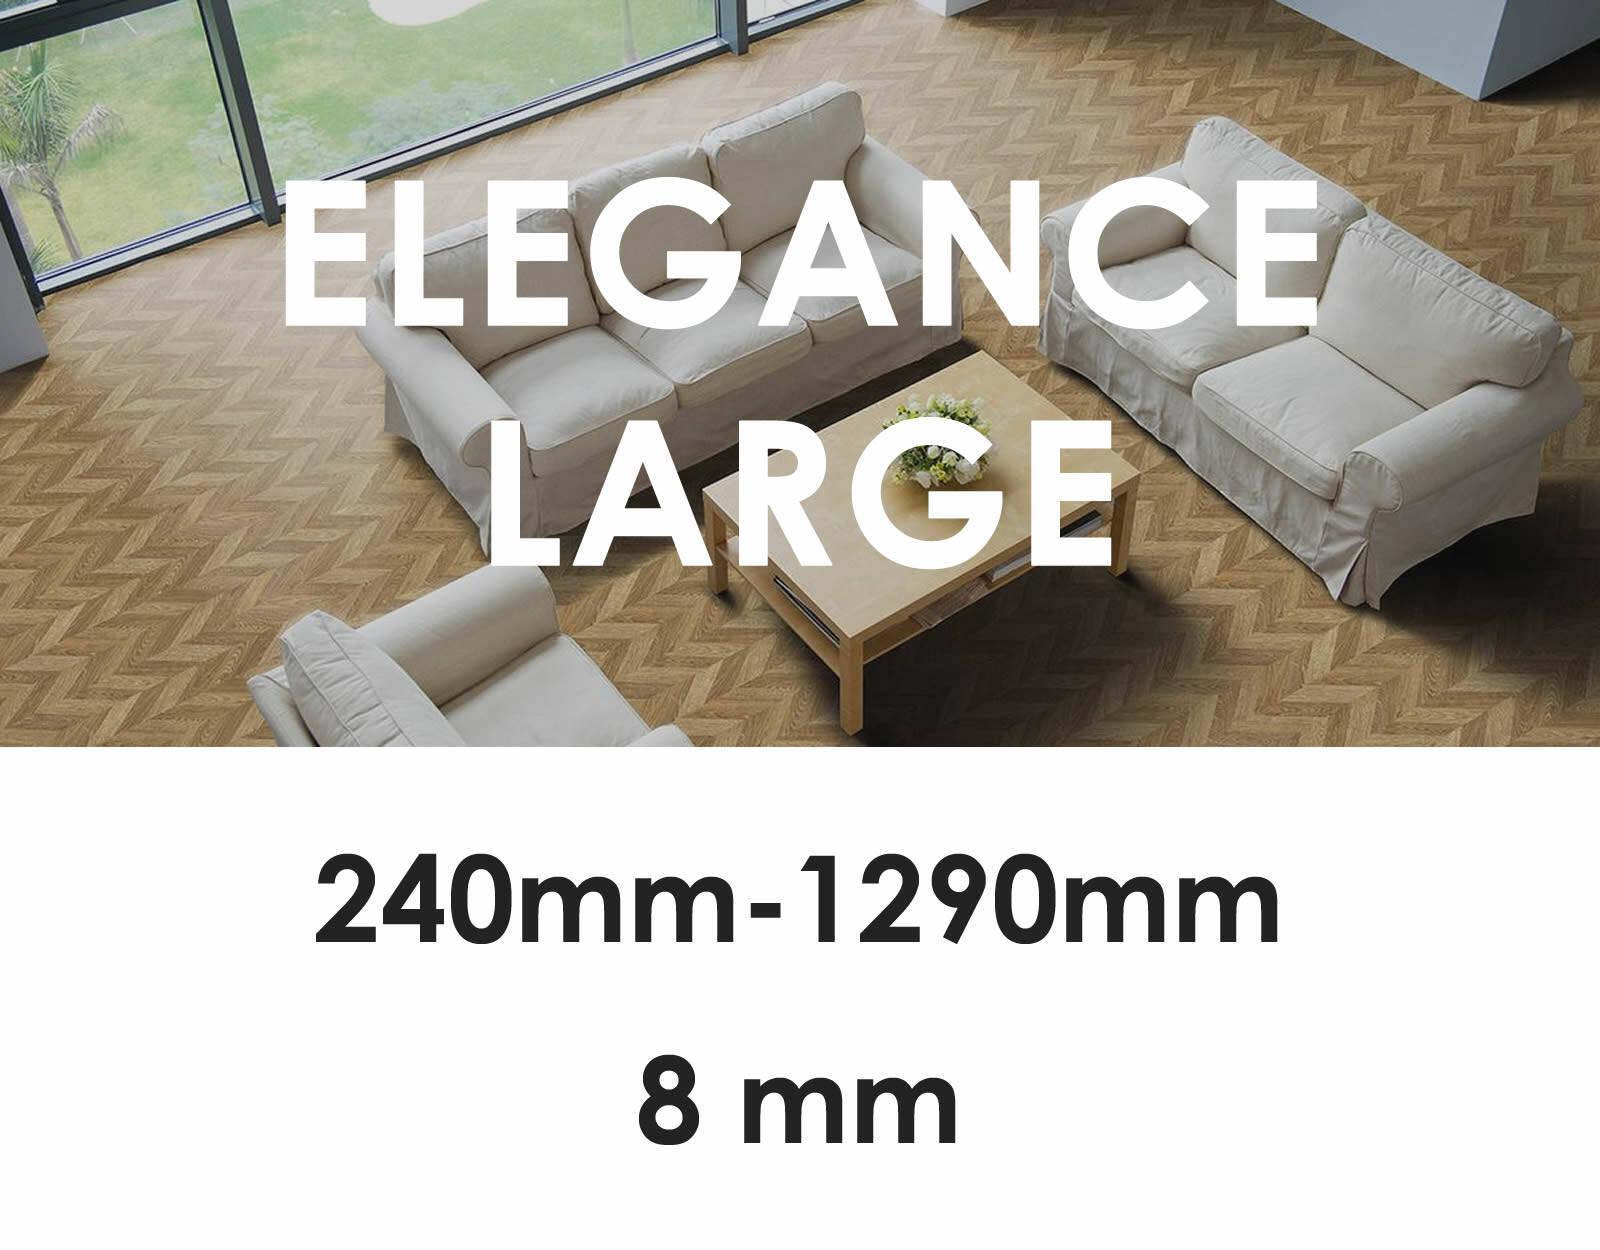 Elegance Large